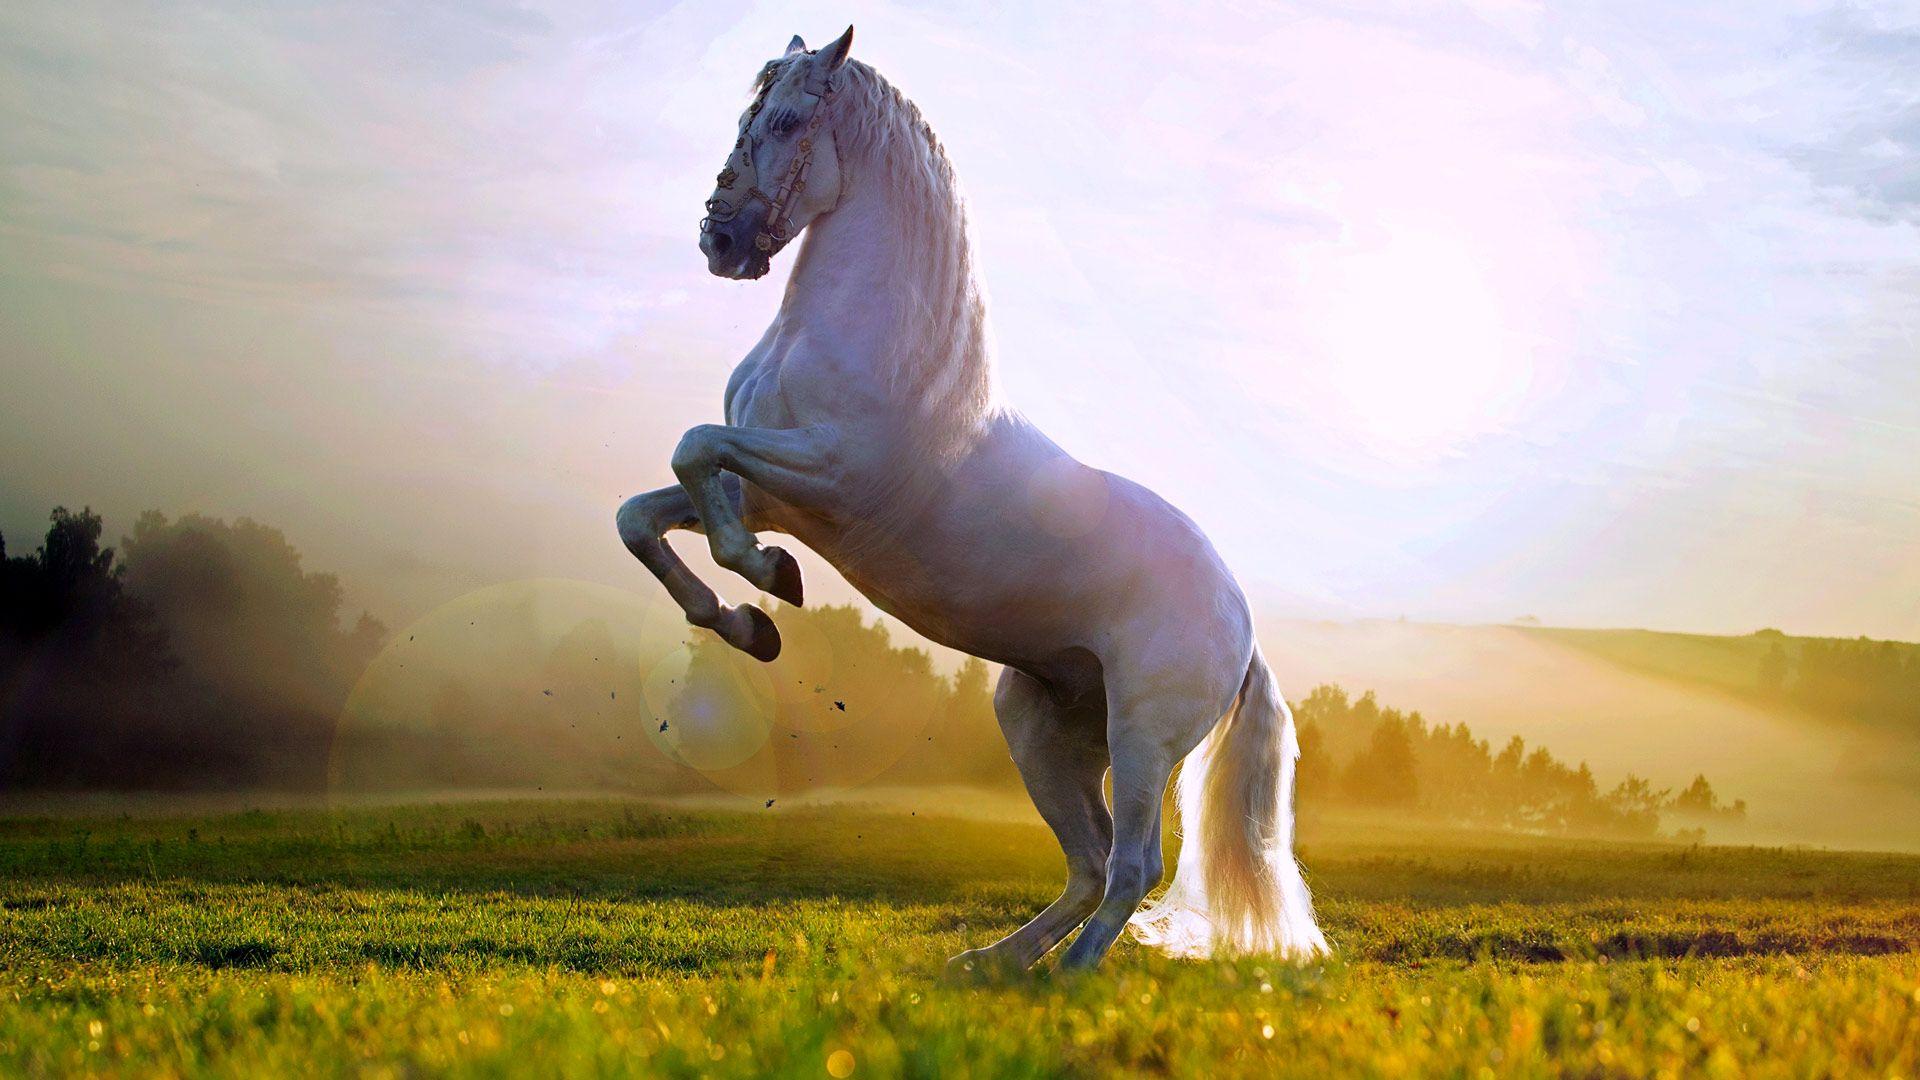 Beautiful white horse standing up wallpaper HD 1080p for Desktop 1920x1080